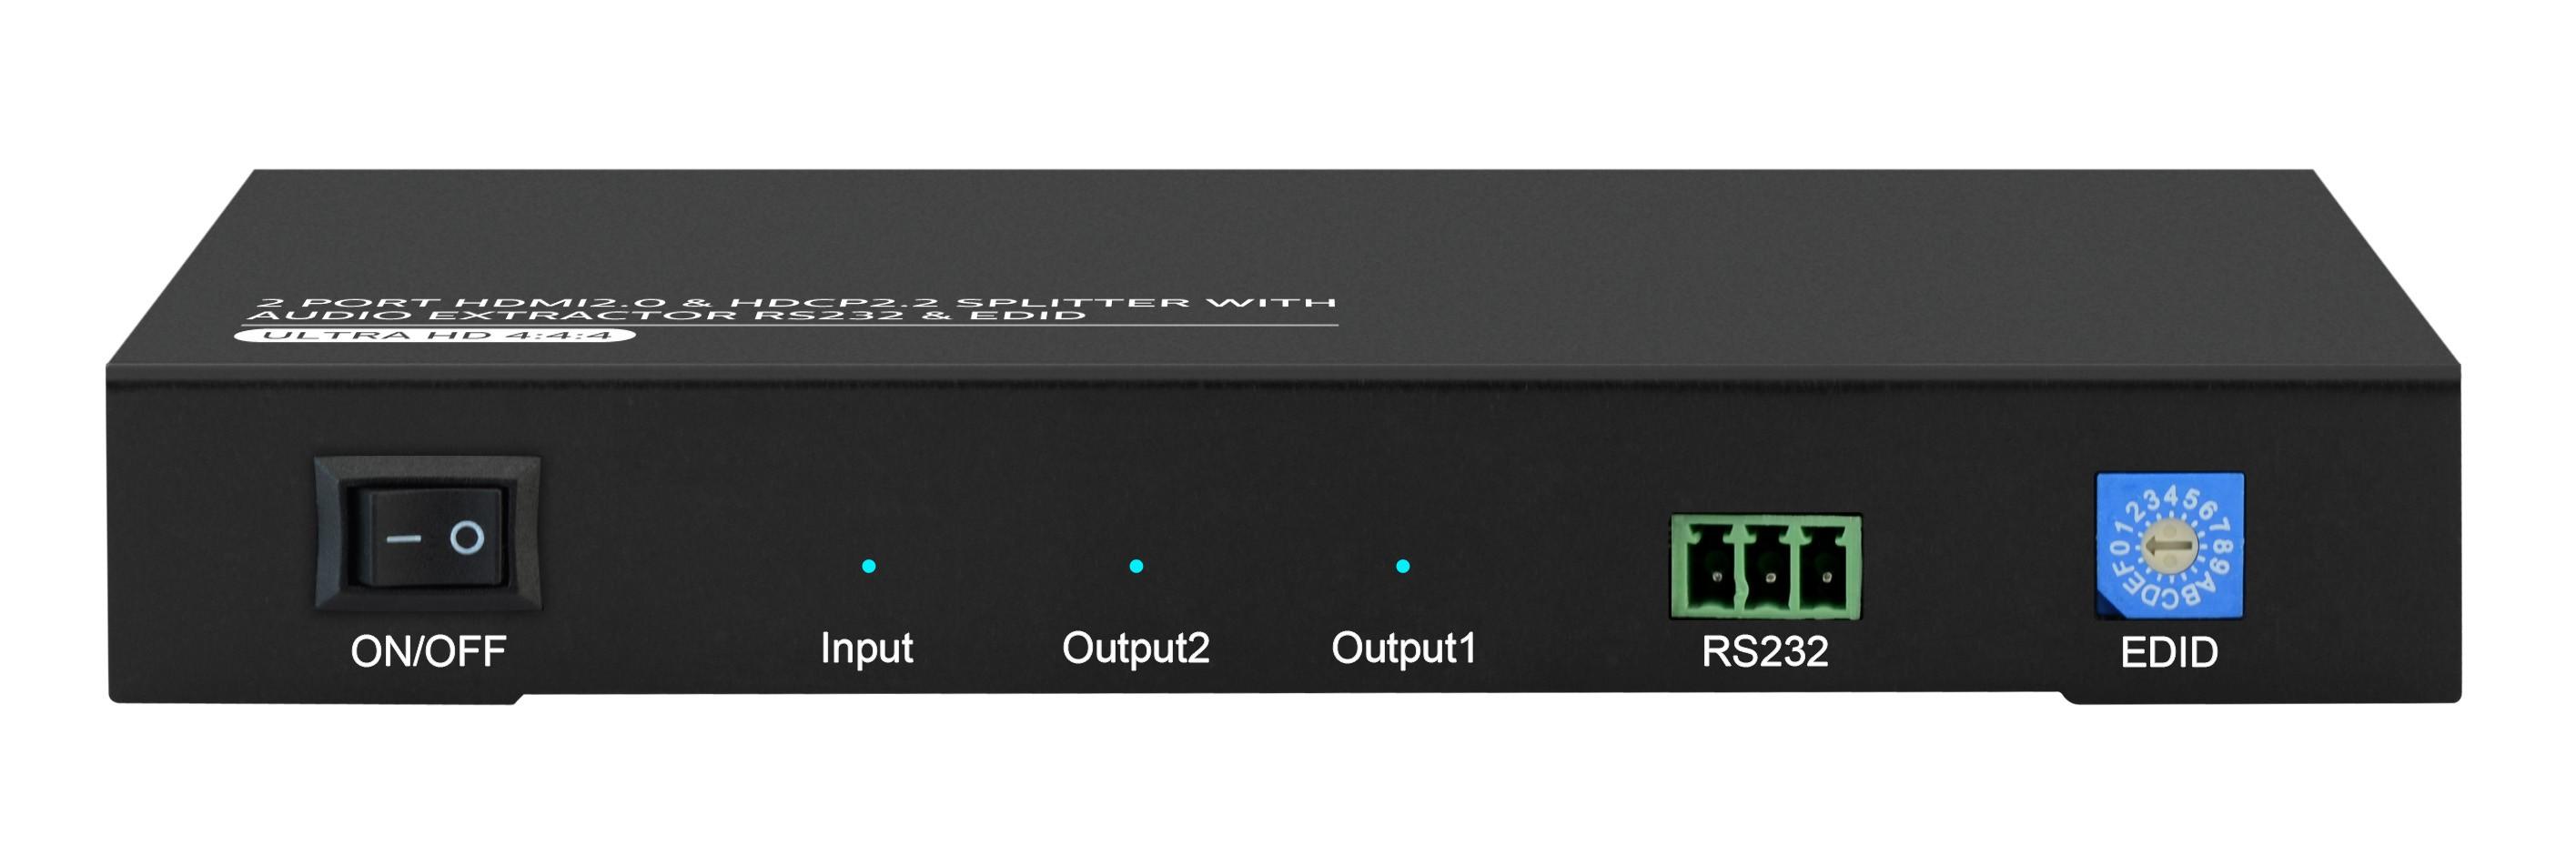 1X2 HDMI2.0 & HDCP2.2 SPLITTER